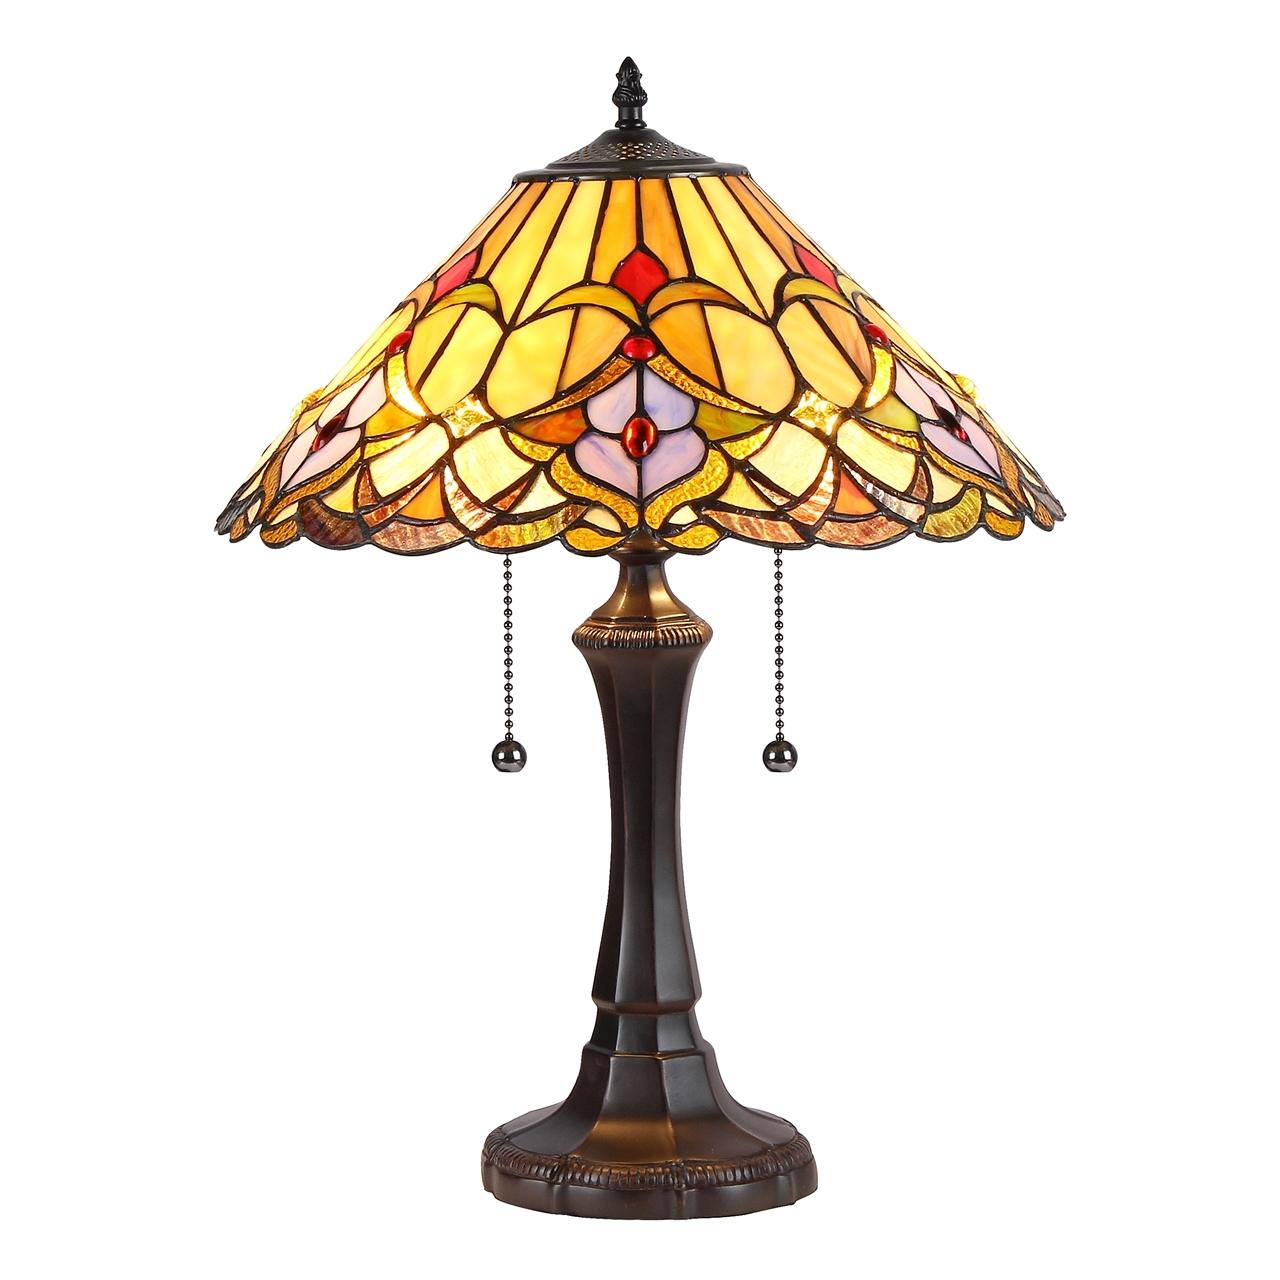 Chloe Lighting Inc Tiffany Lamp Tiffany Lamps Tiffany